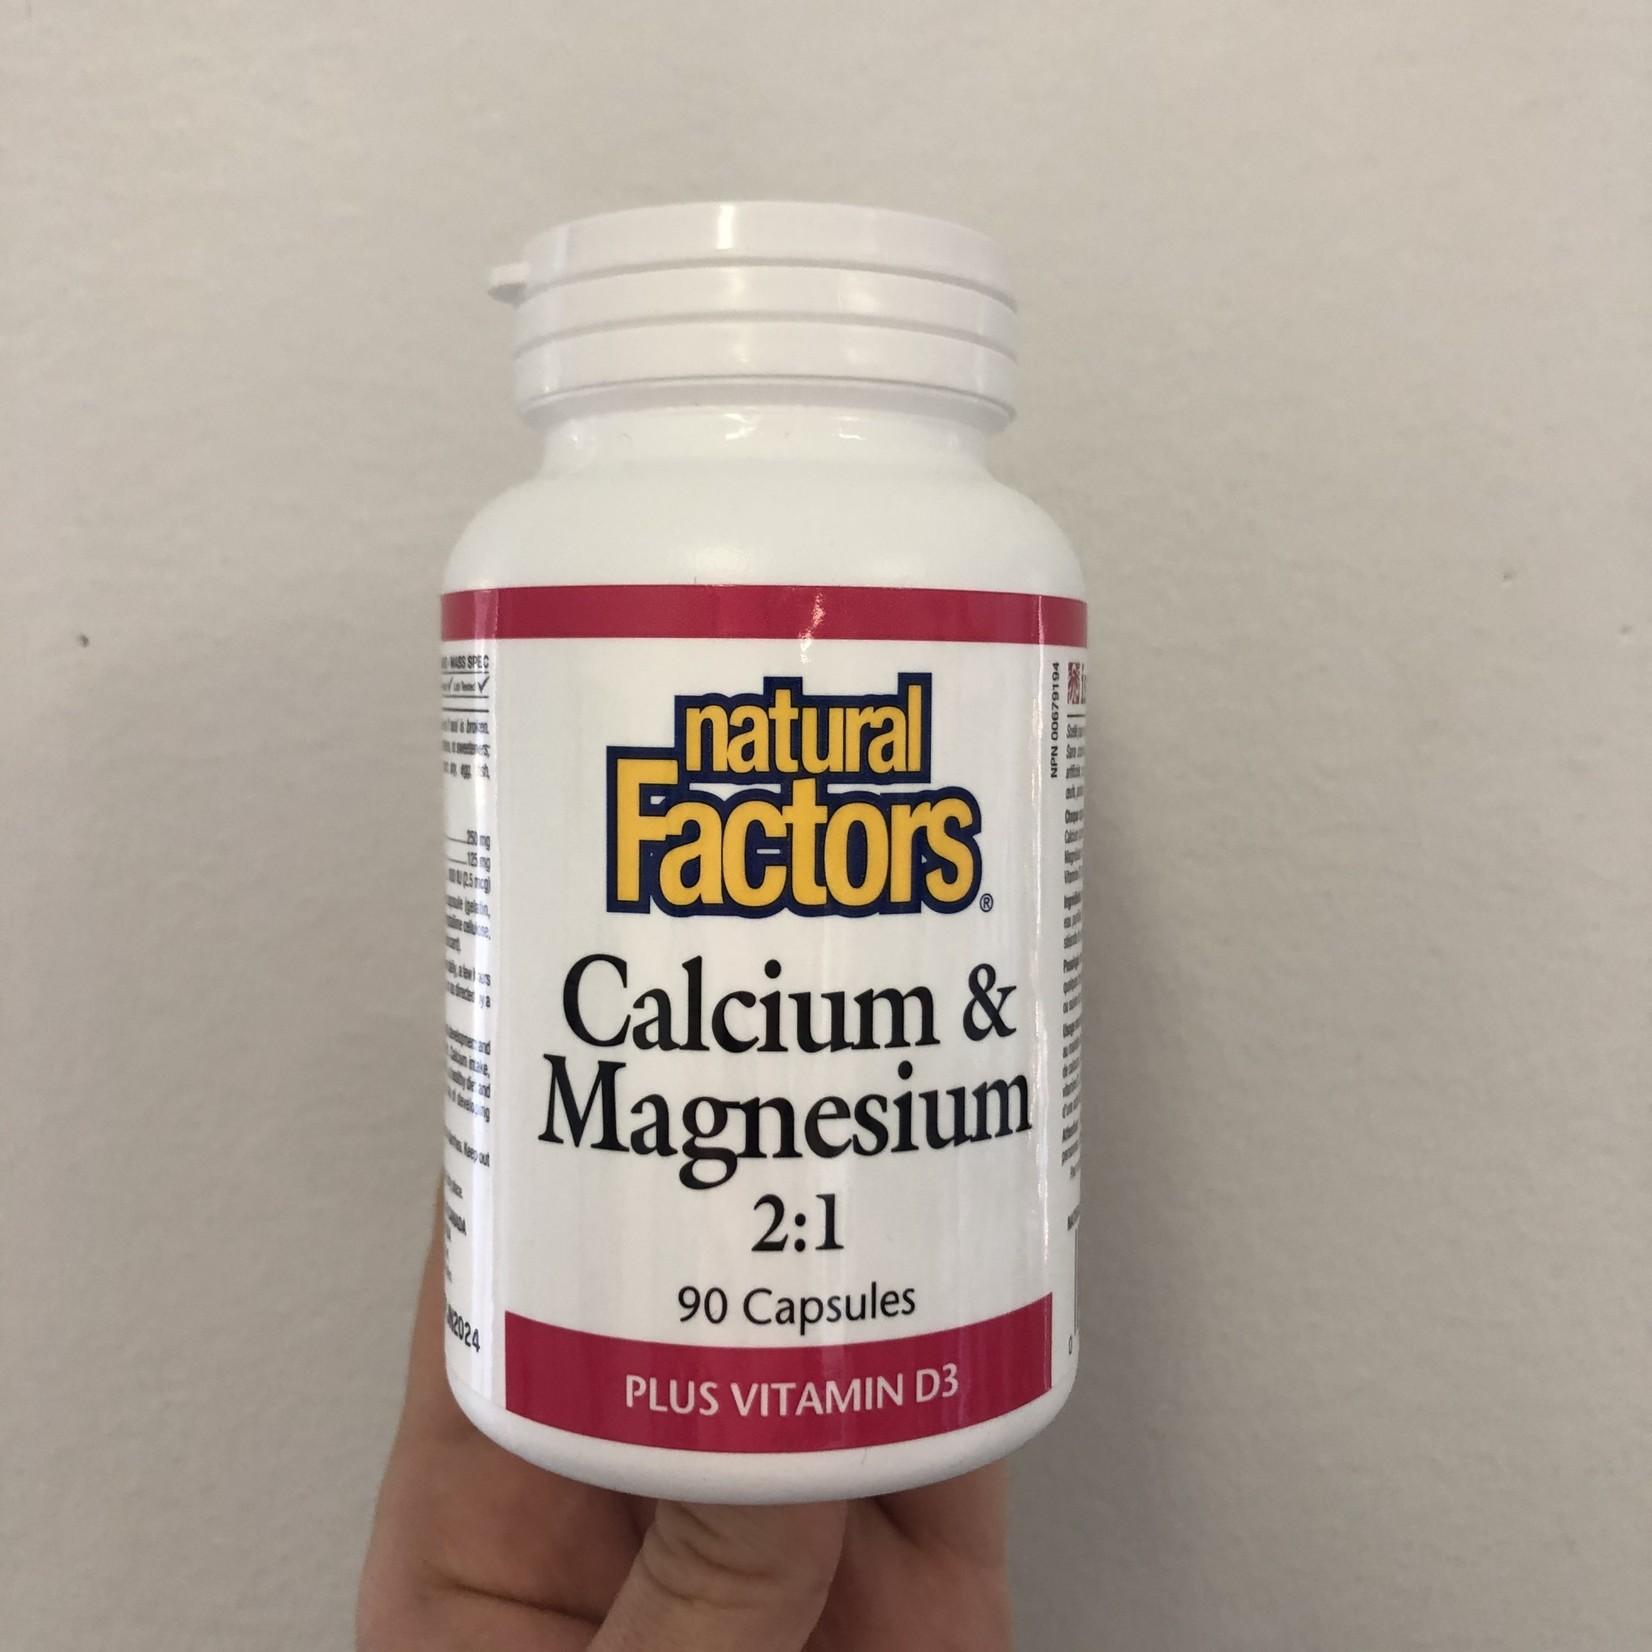 Natural Factors Natural Factors Calcium & Magnesium 2:1 Plus Vitamin D3 90 caps